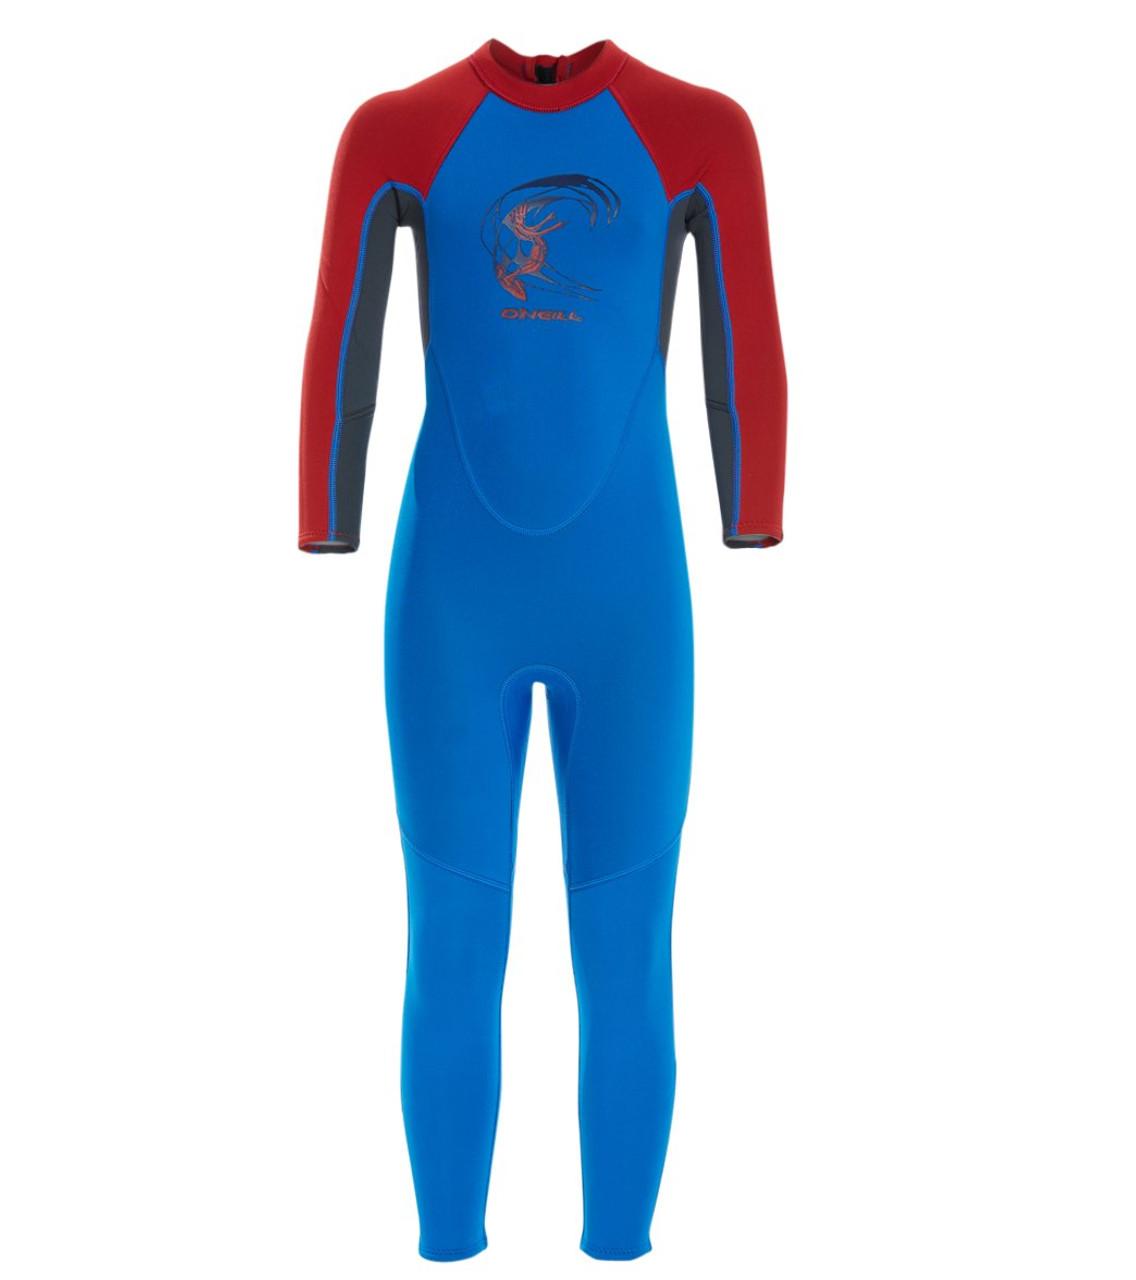 O'NEILL Toddler Reactor Full Wetsuit